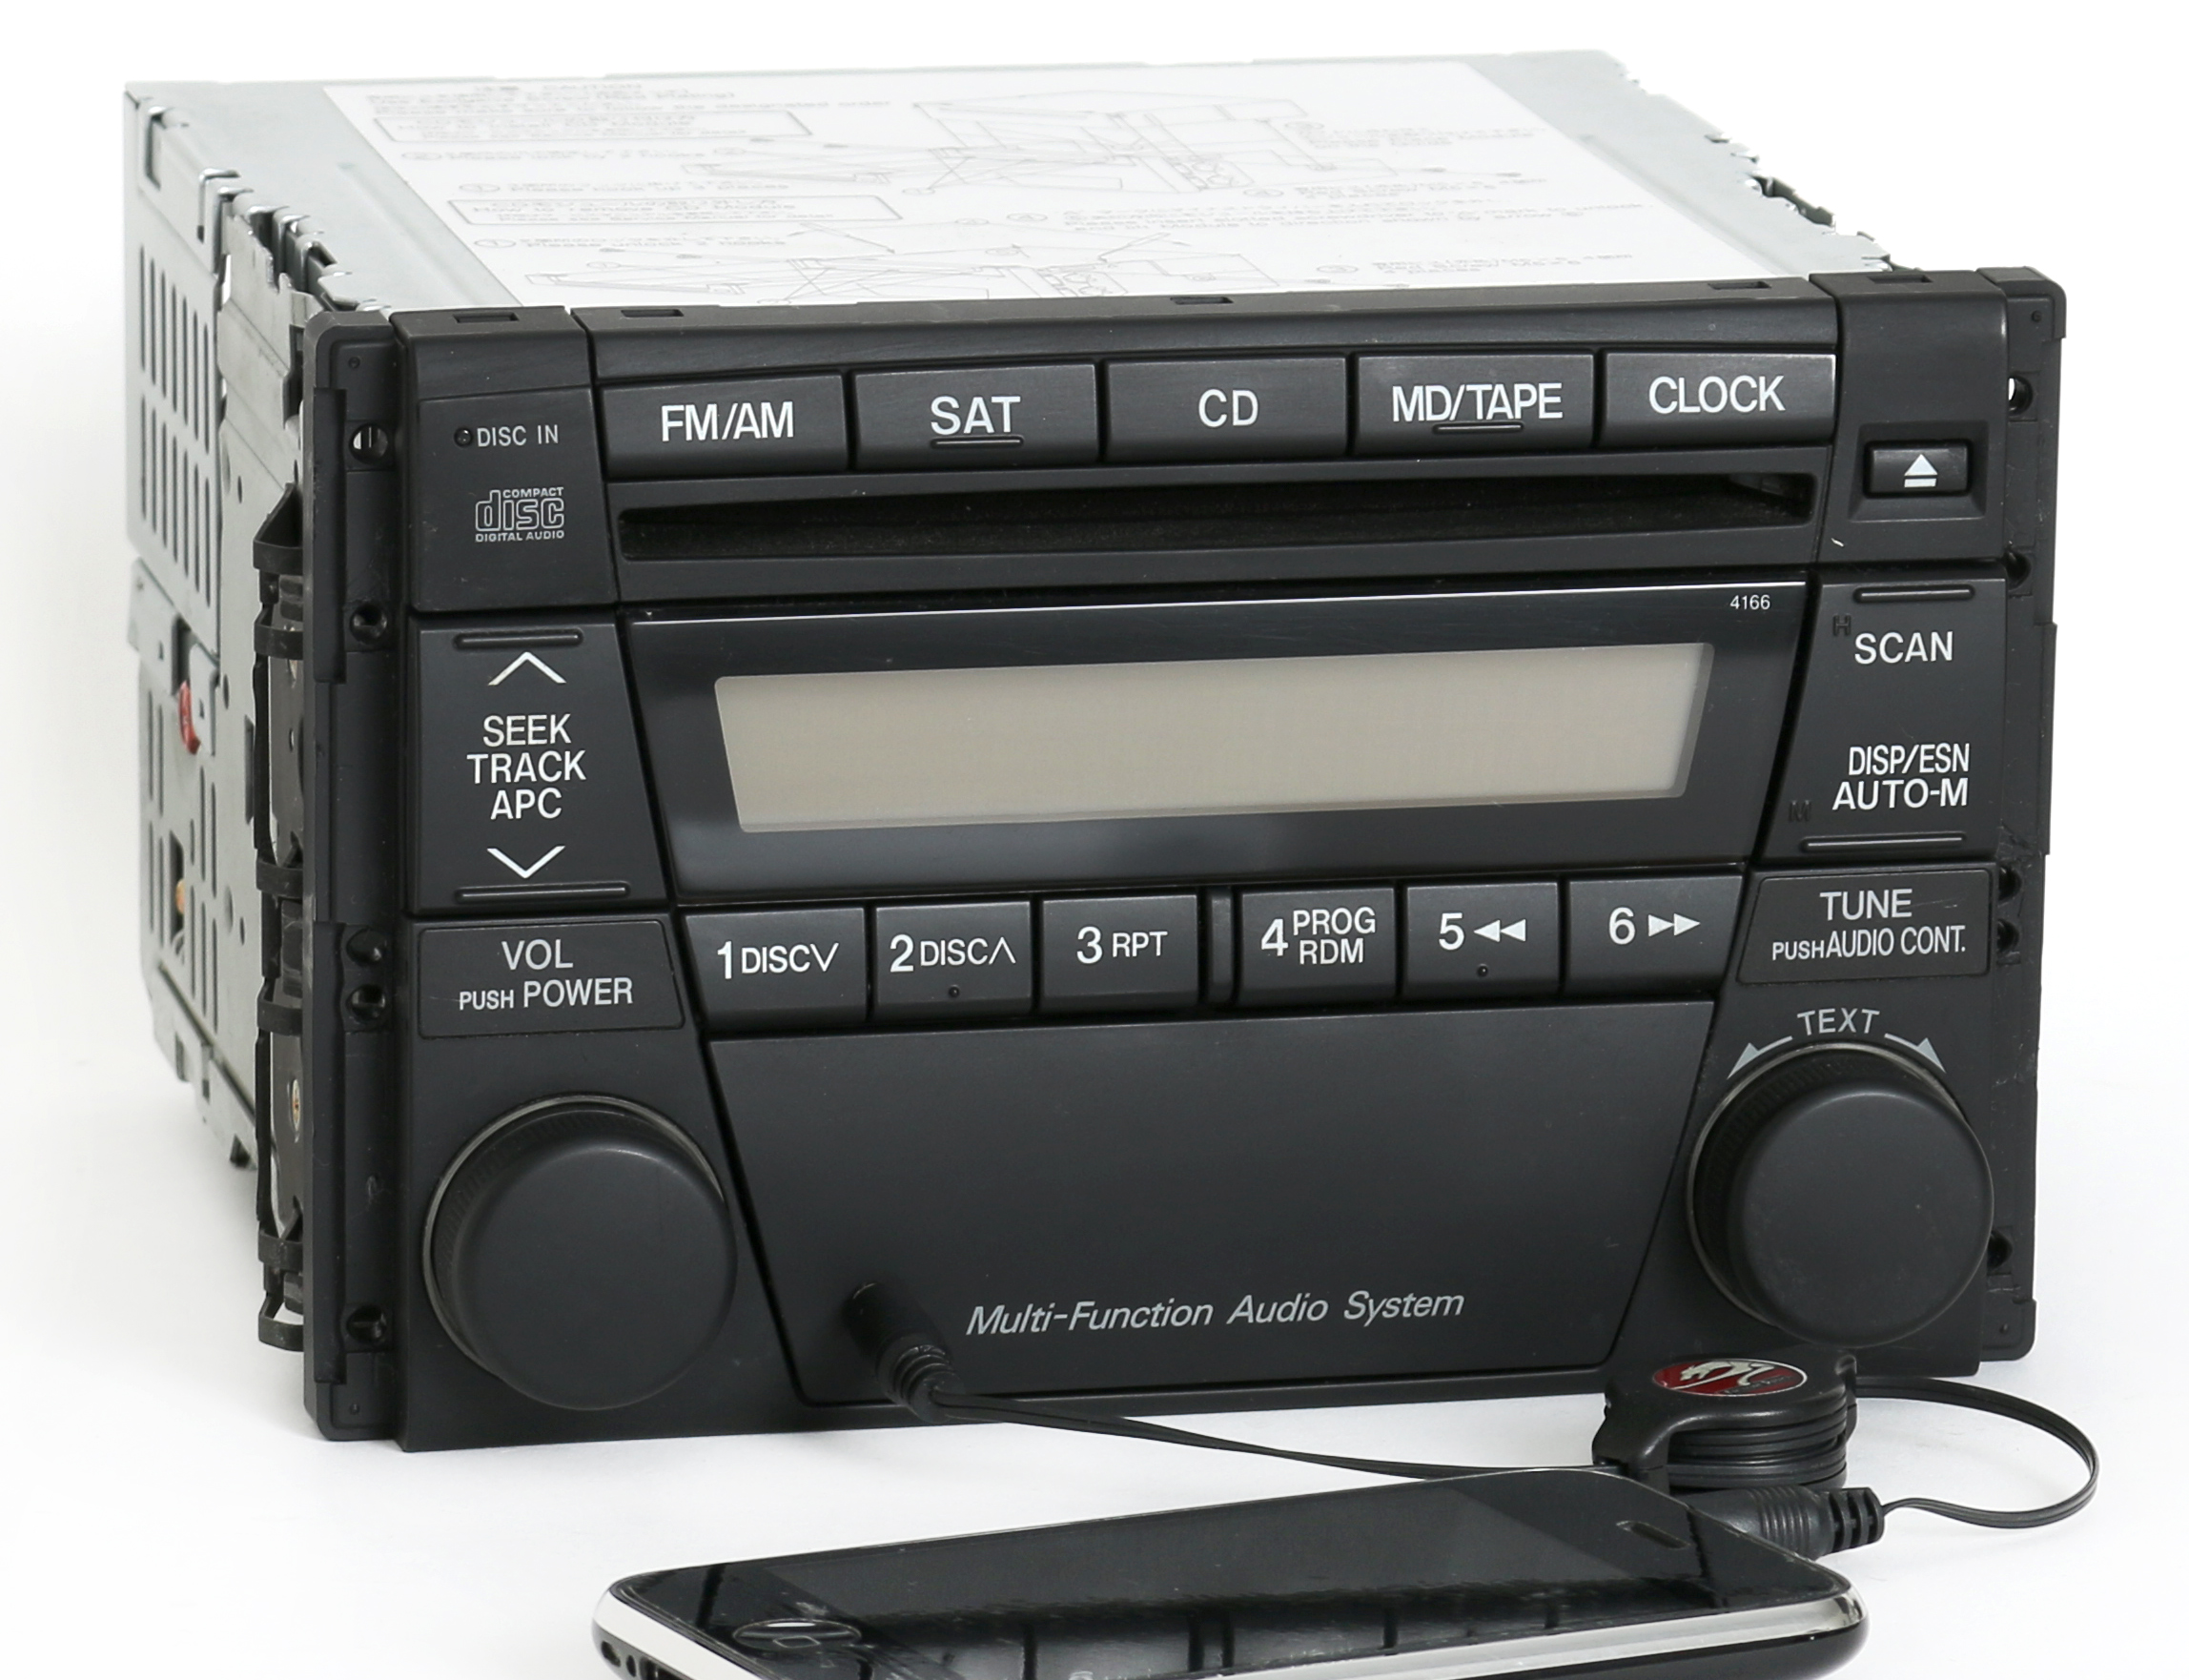 Remanufacture Aux Mod SERVICE OEM For Mazda Tribute AM FM CD - 2005 acura tl aux input